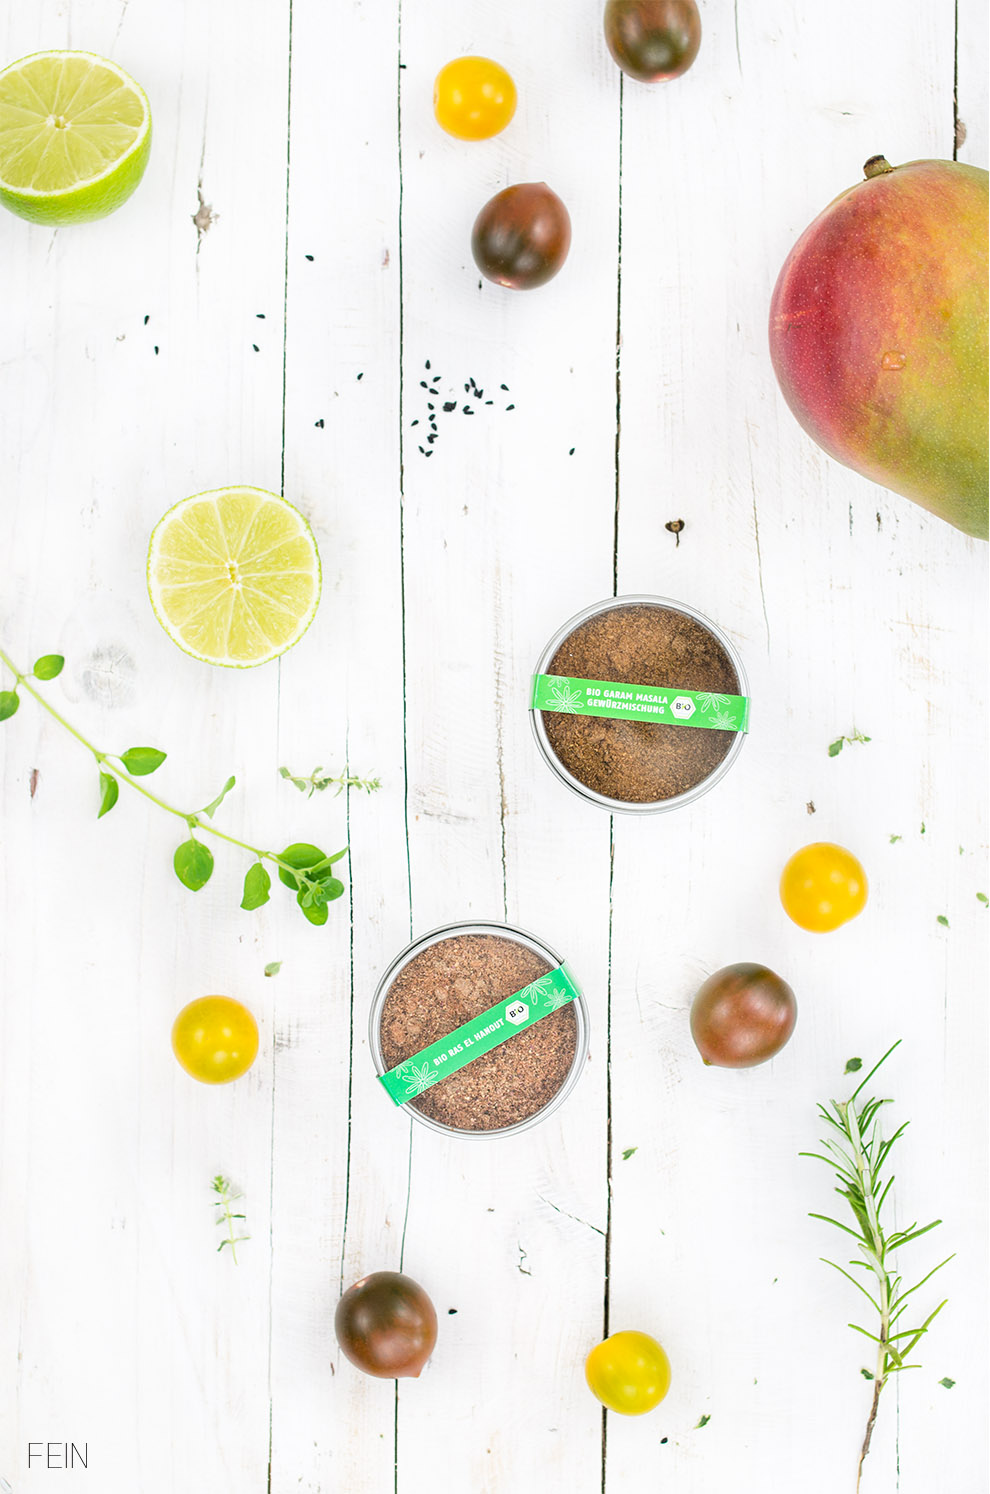 Jackfrucht Gewürz Gemüse